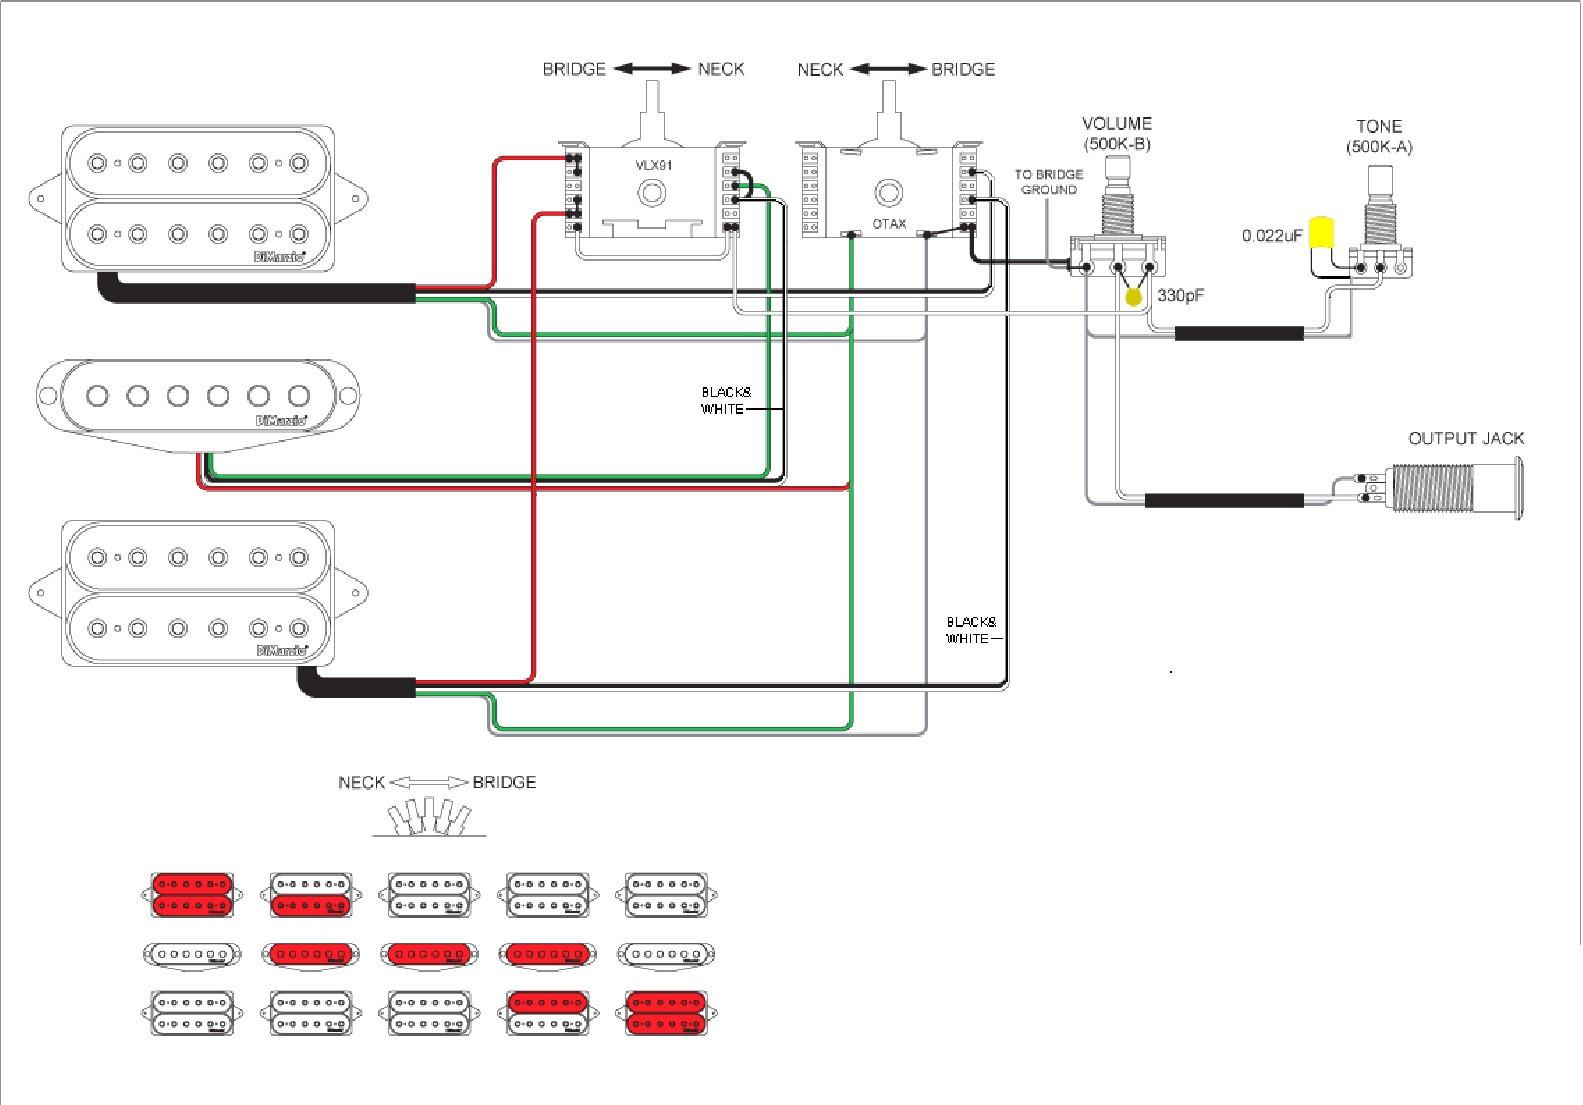 Hs Wiring Diagram Free Download - duflot-conseil.fr cable-stale -  cable-stale.duflot-conseil.fr | Wilkinson Humbucker Wiring Diagram Free Download |  | diagram database - Duflot Conseil